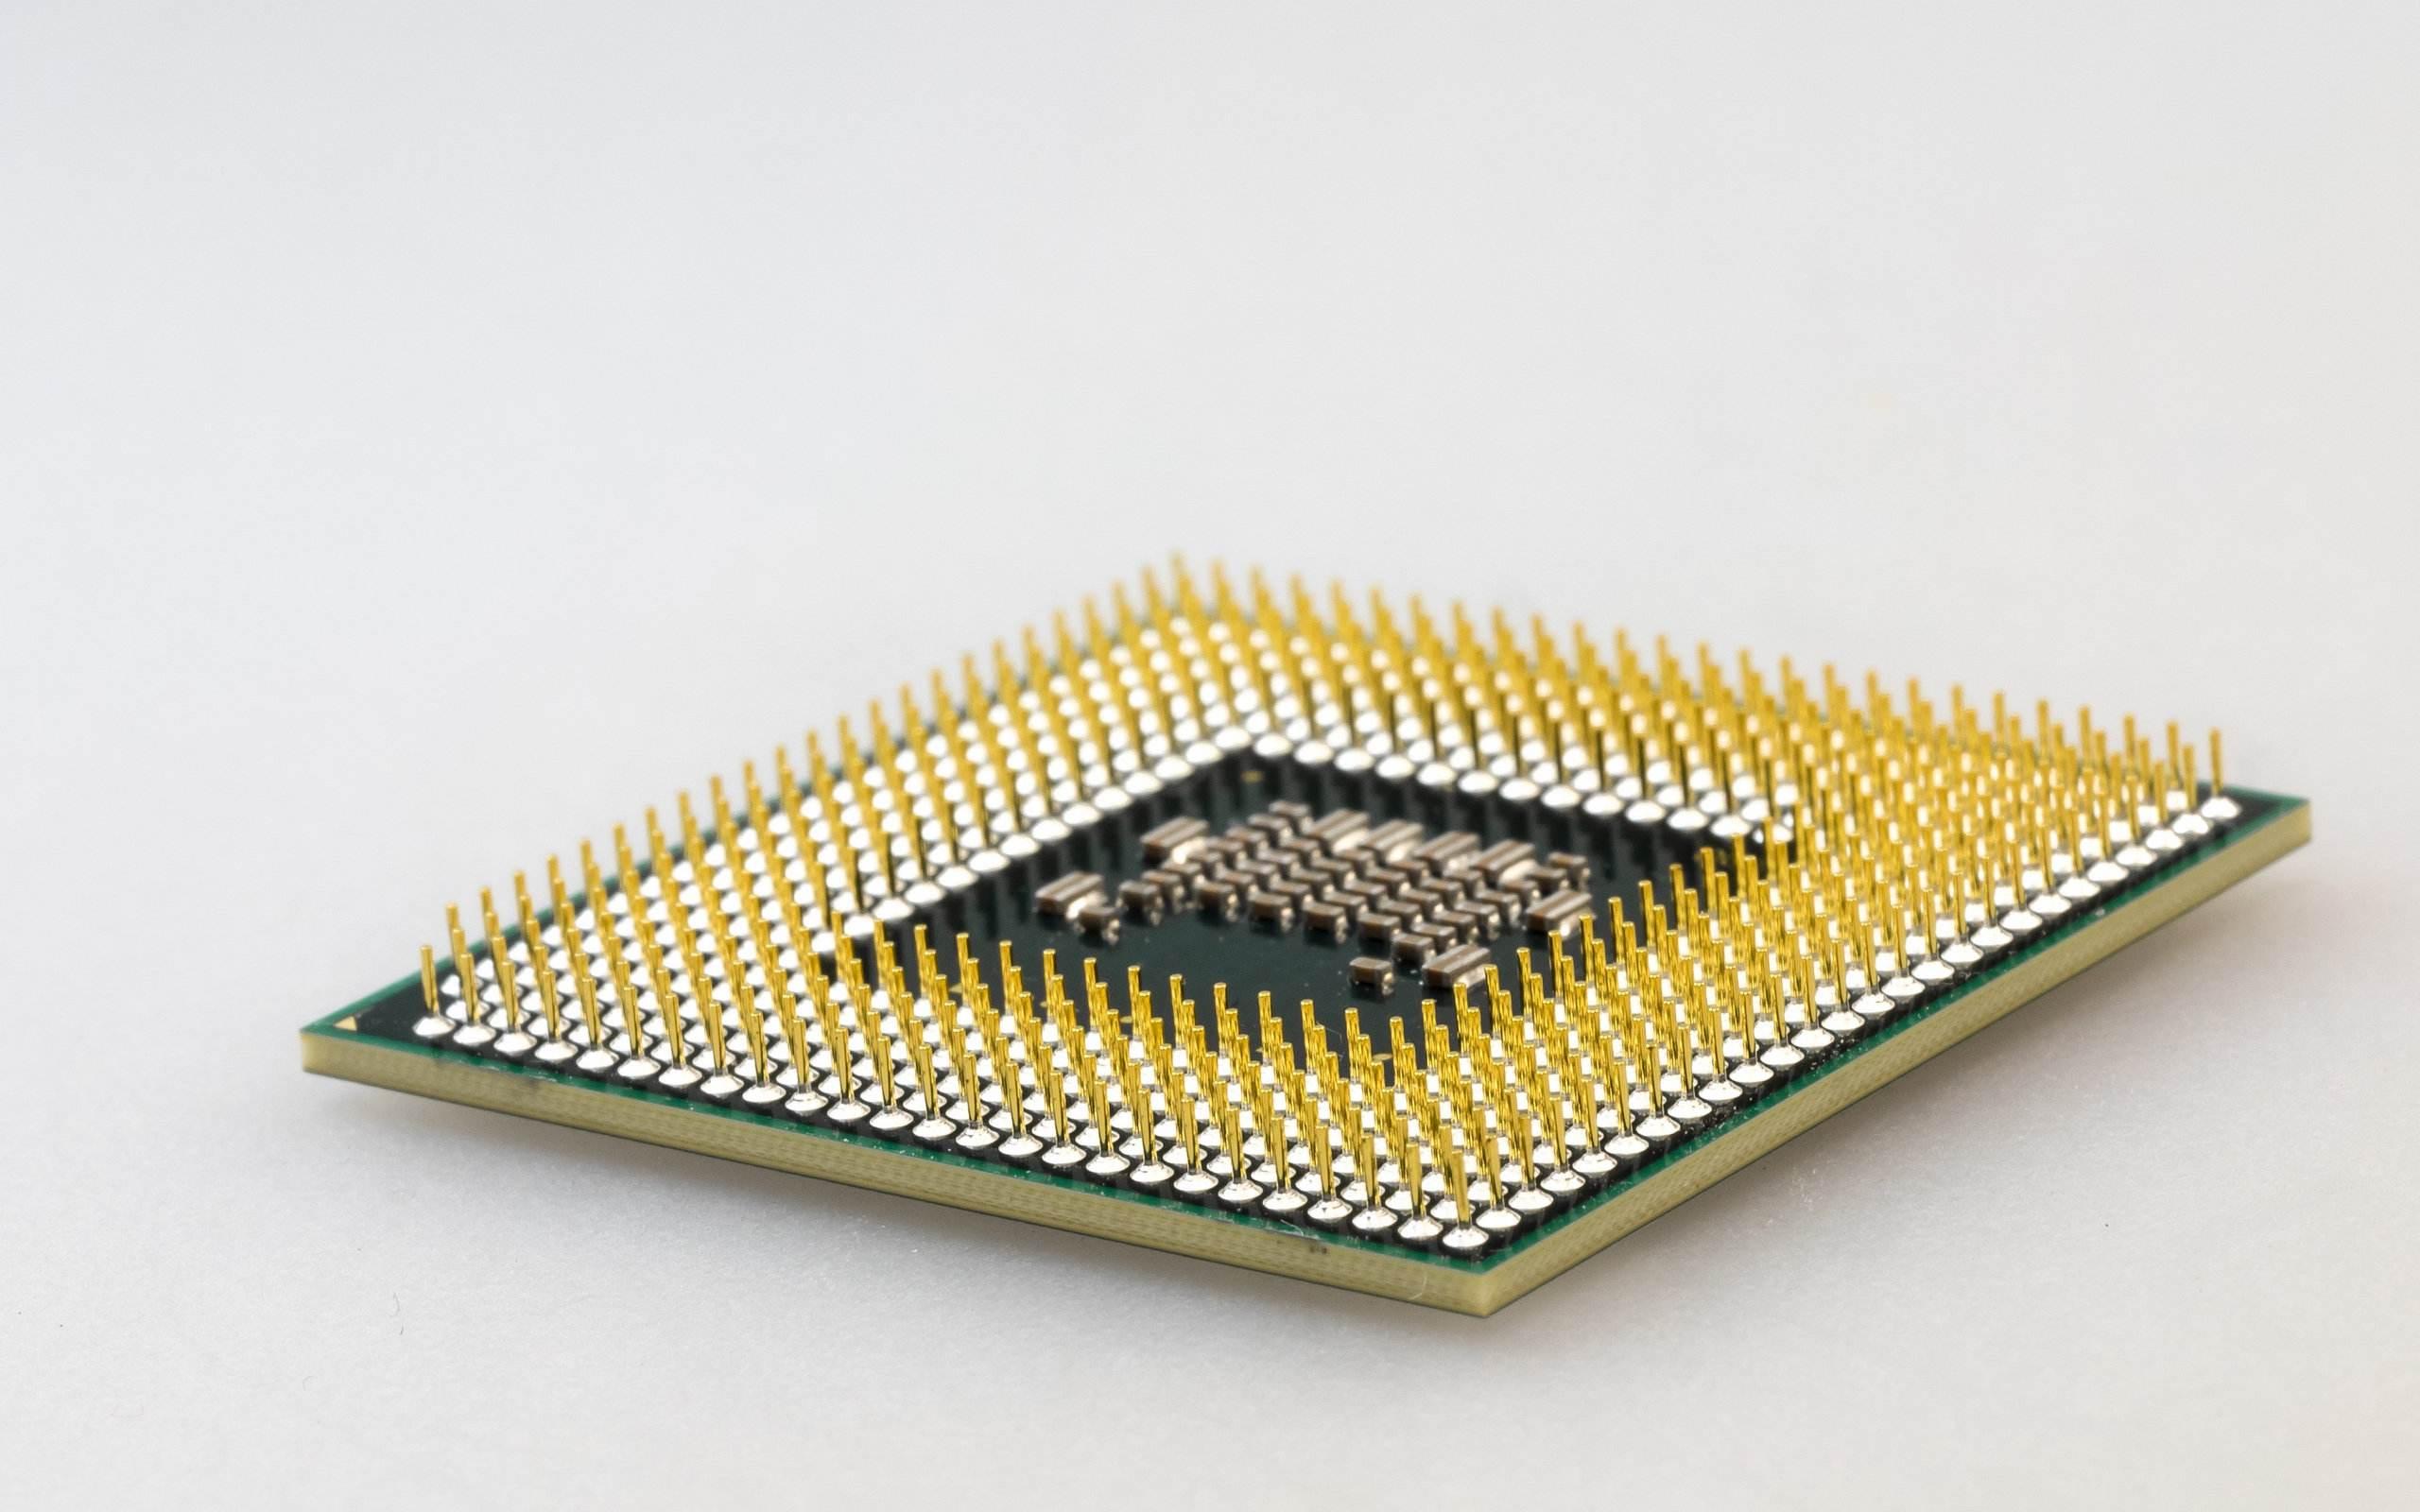 AI芯片制造商Hailo发布深度学习处理器 可运行ADAS等复杂汽车应用